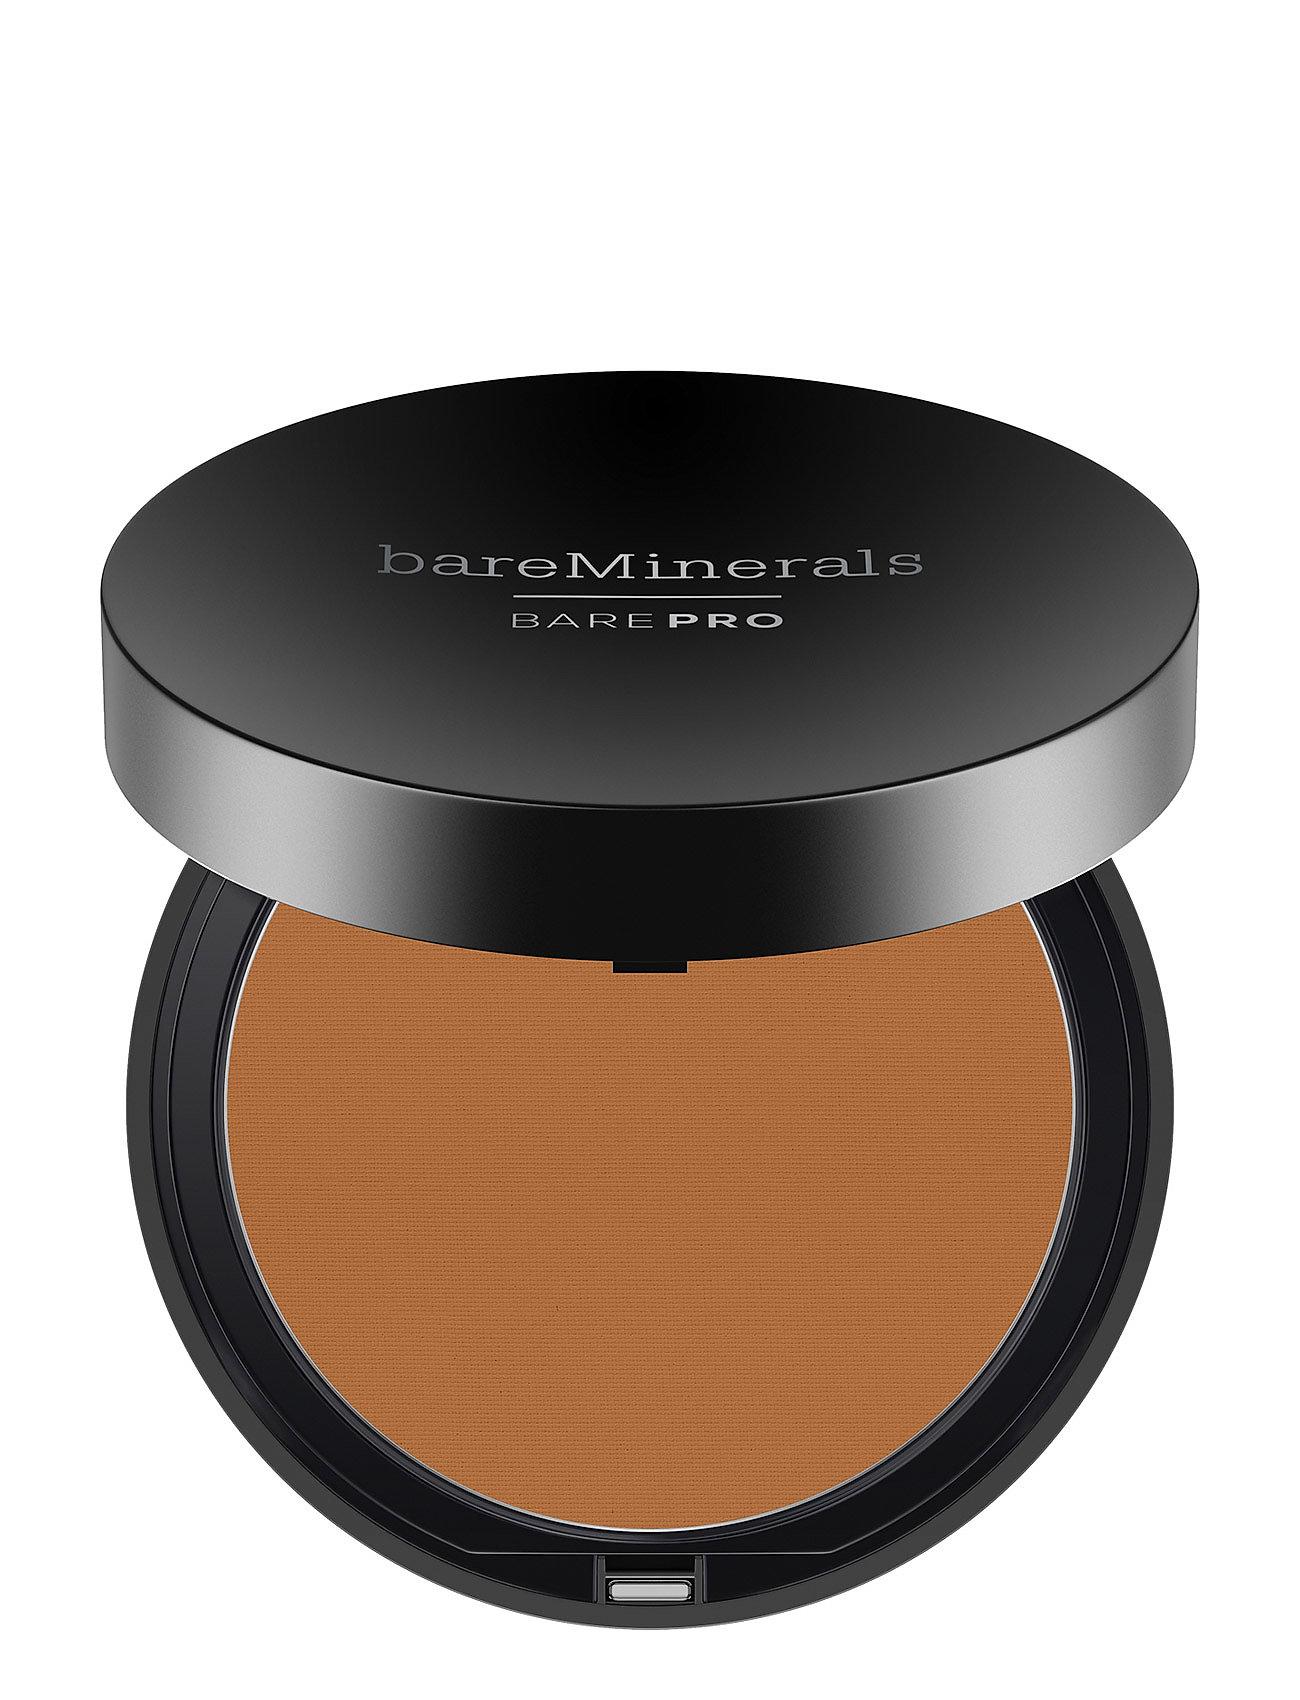 Image of Barepro Performance Wear Powder Foundation Foundation Makeup BareMinerals (3409964173)